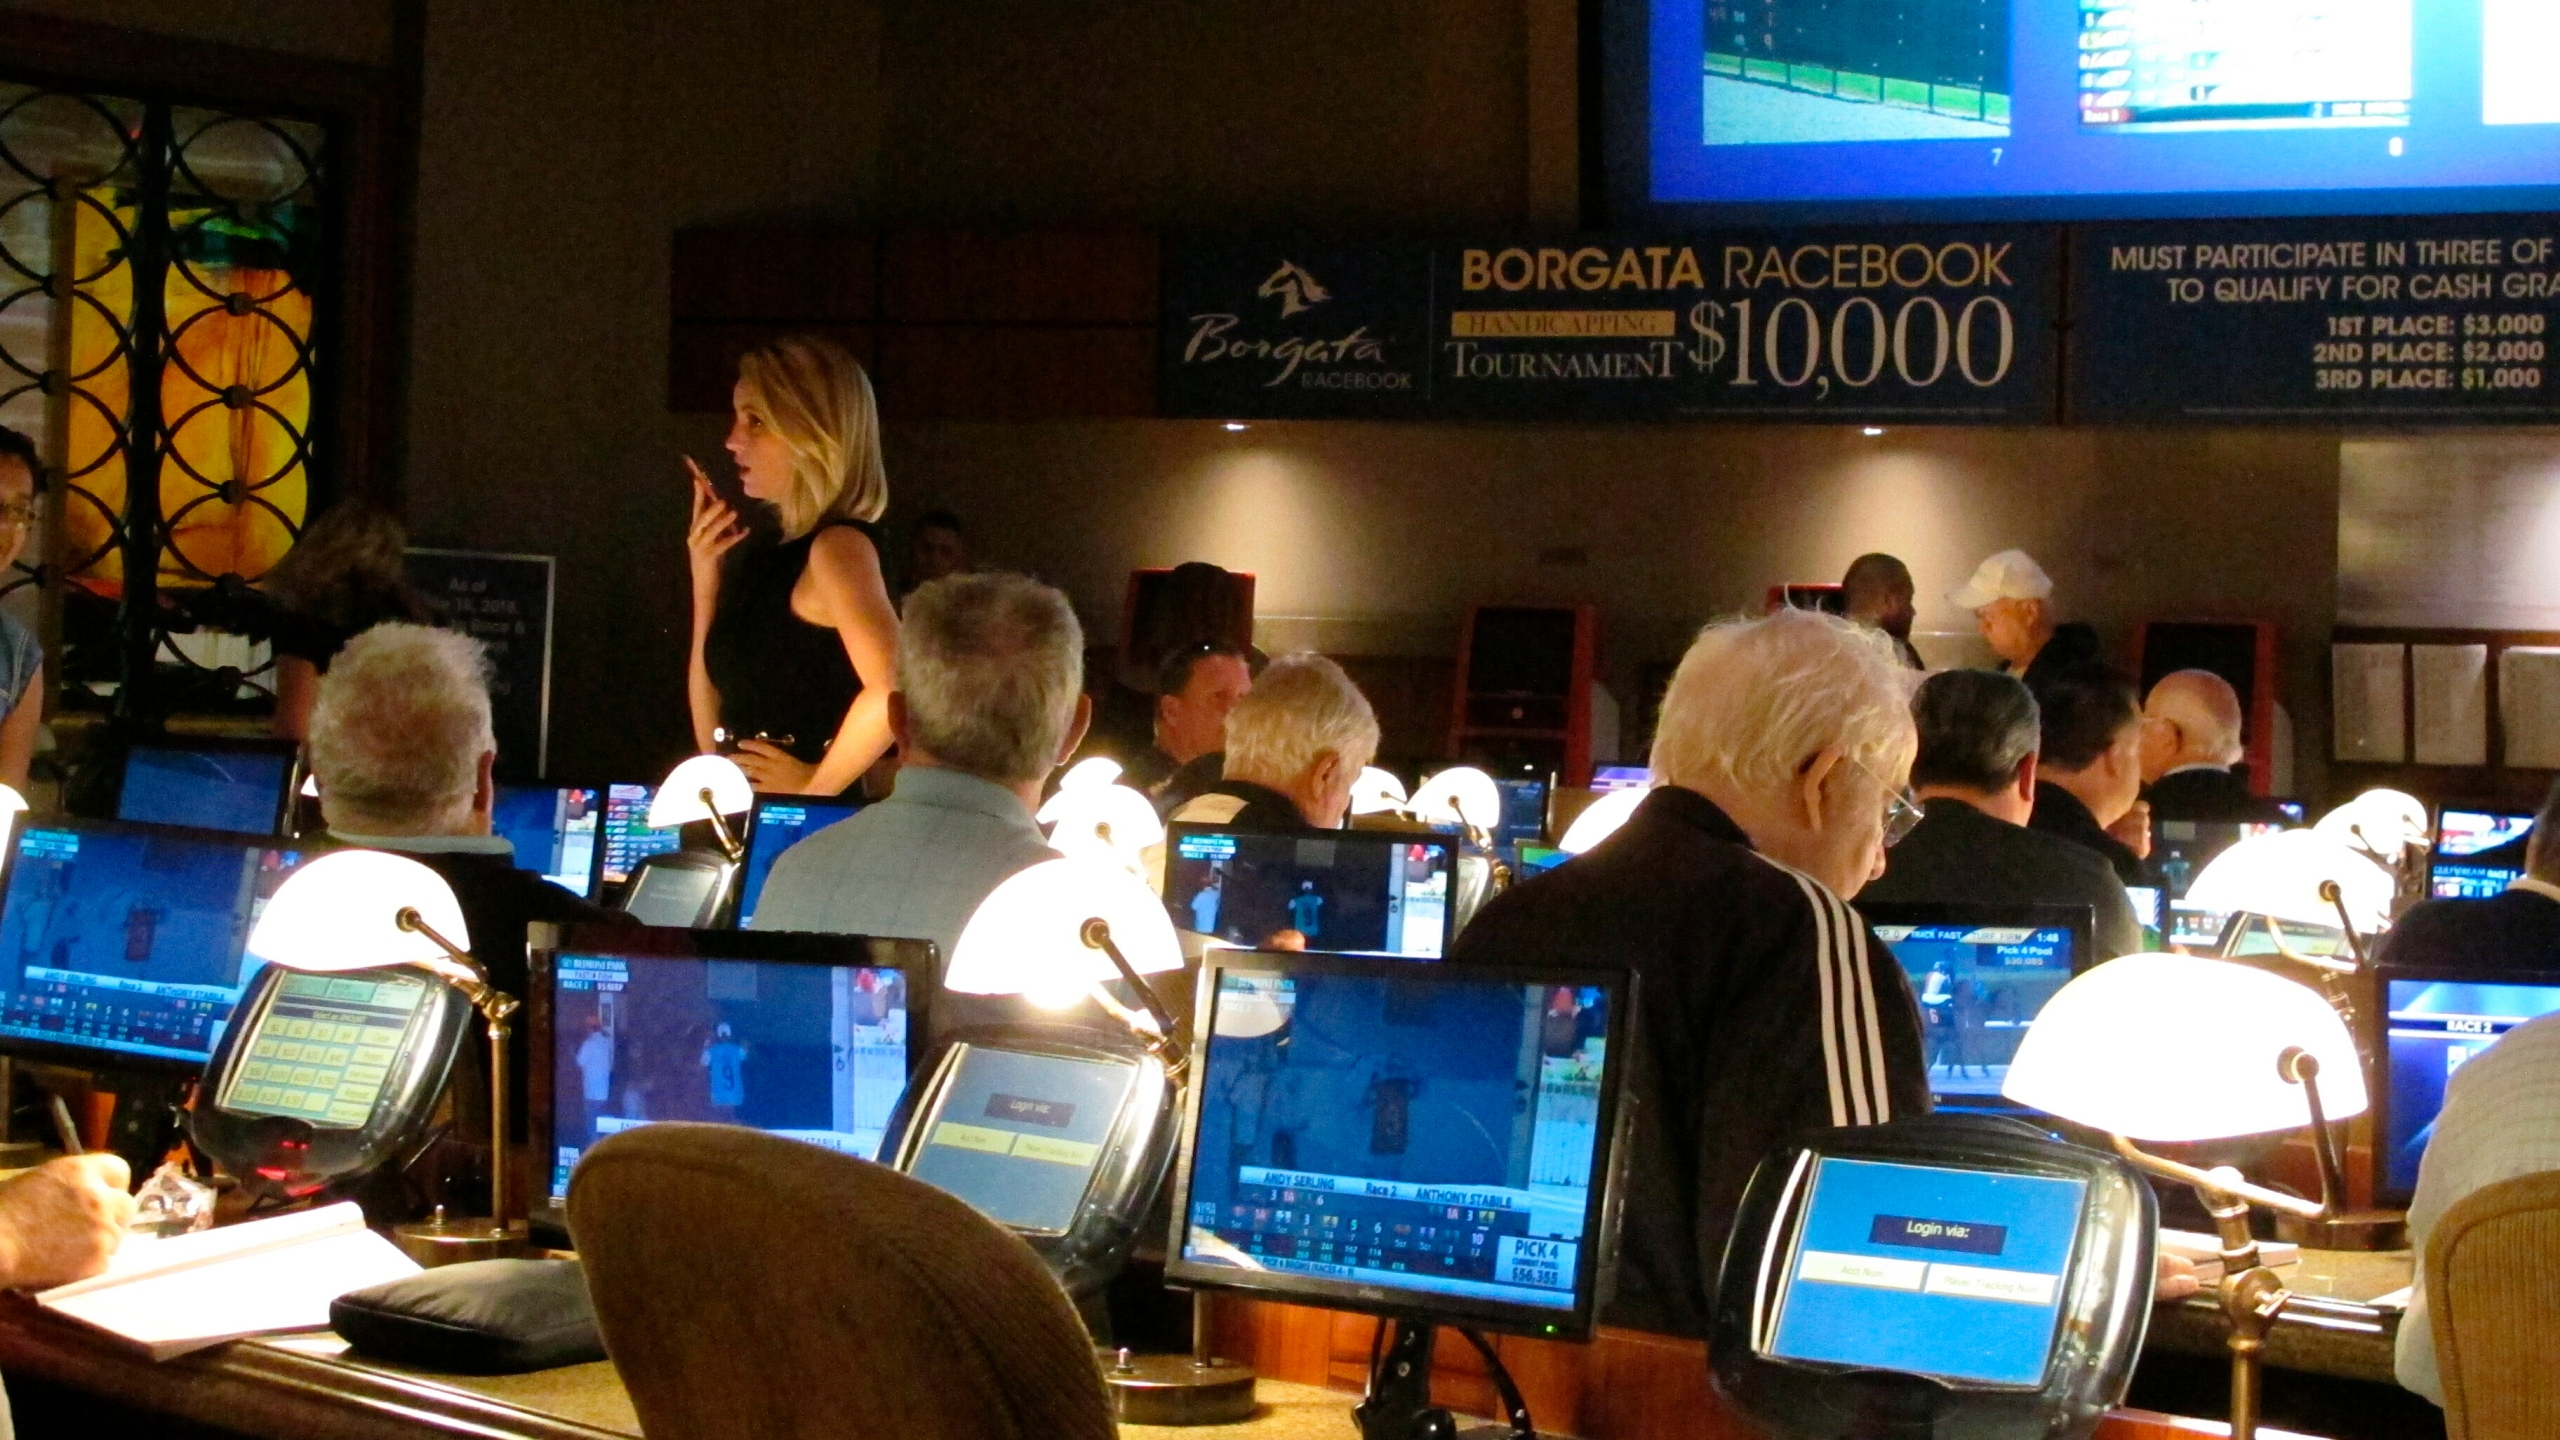 Sports_Betting-Borgata_91350-159532.jpg48071318